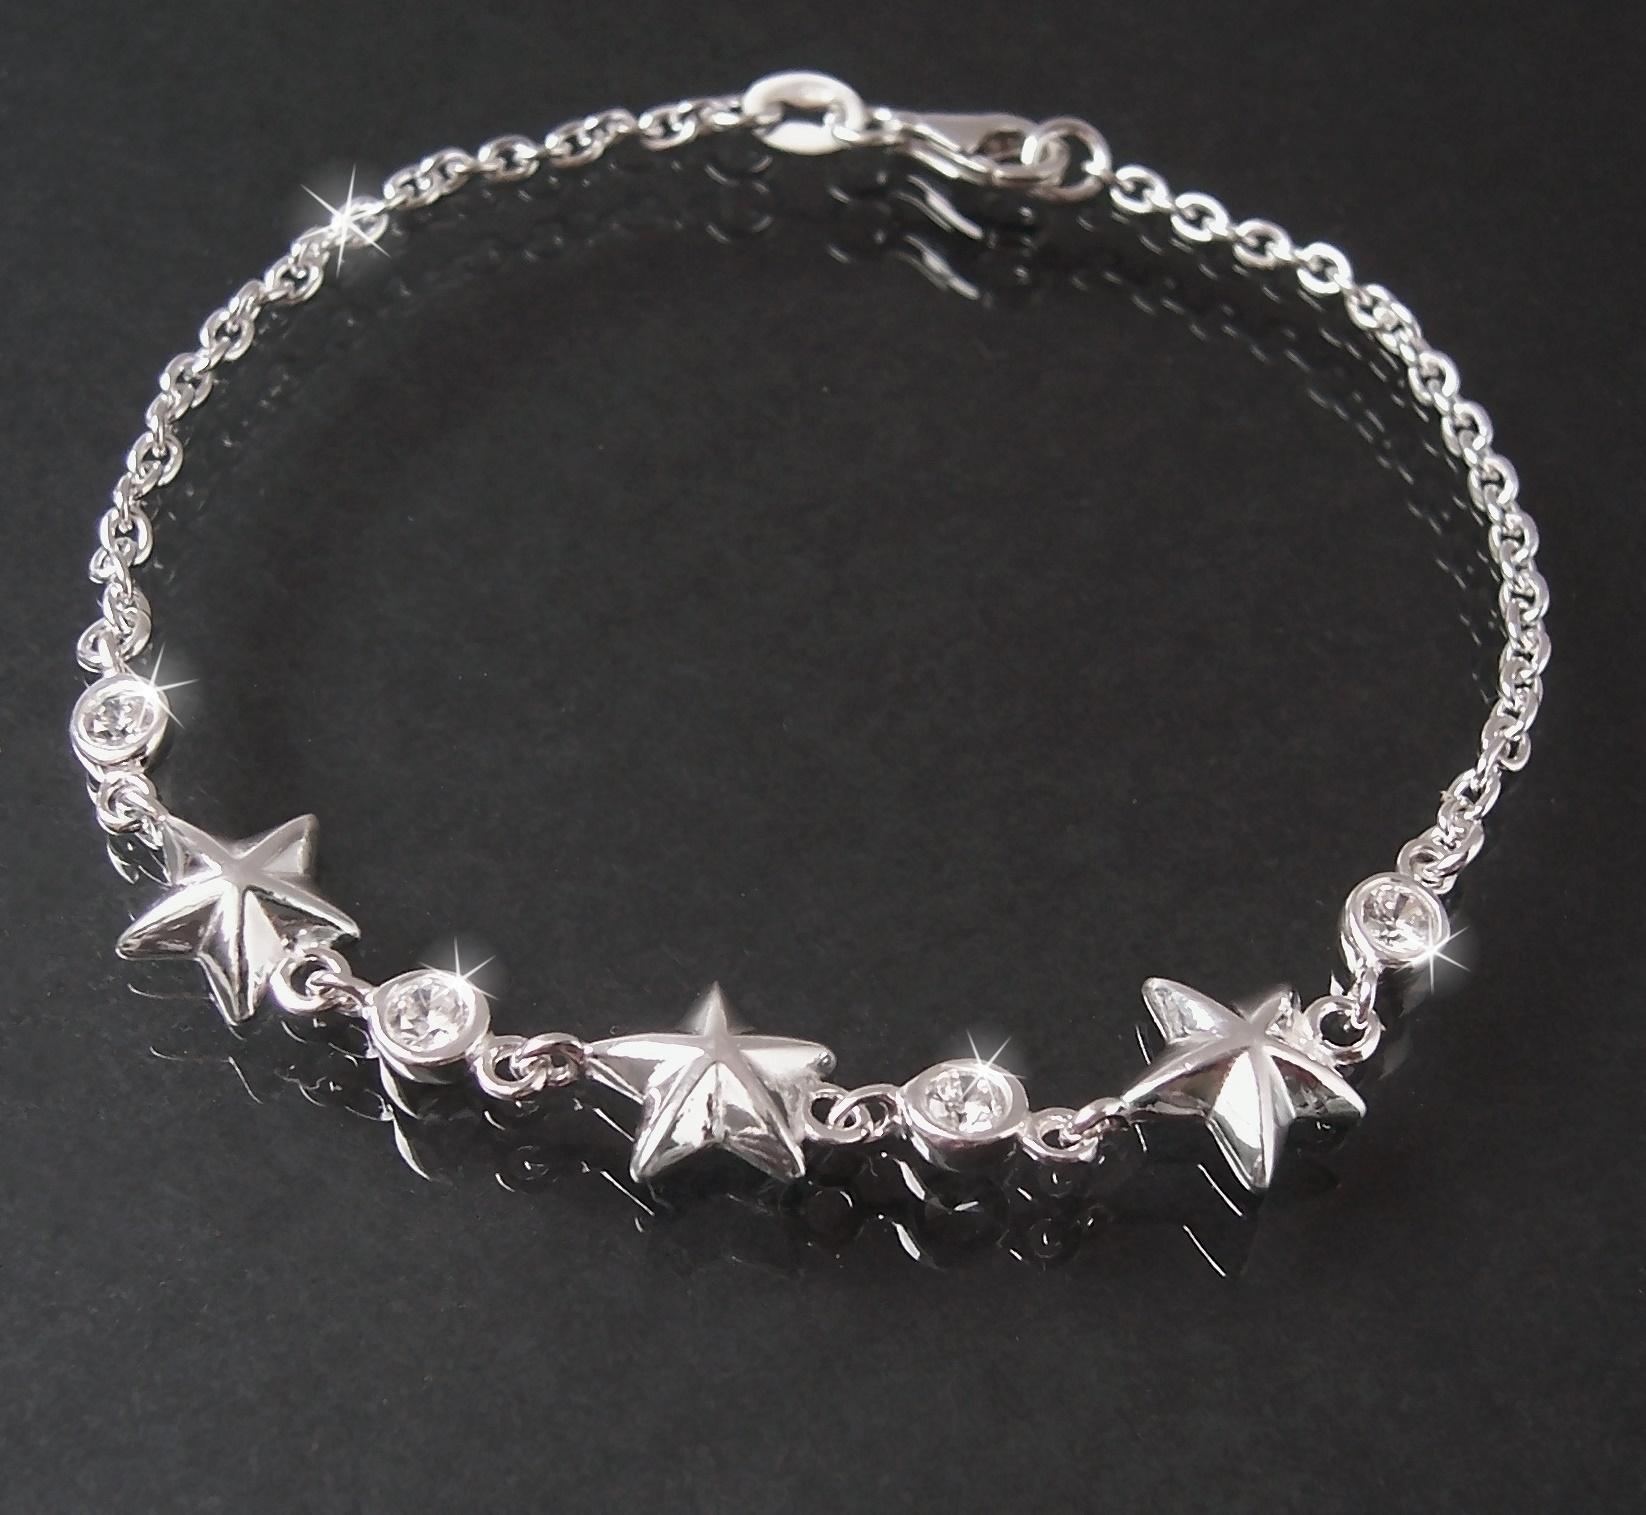 Armband Armkette 925 Silber Ankerkette Sterne Zirkonia 19cm 15020-19